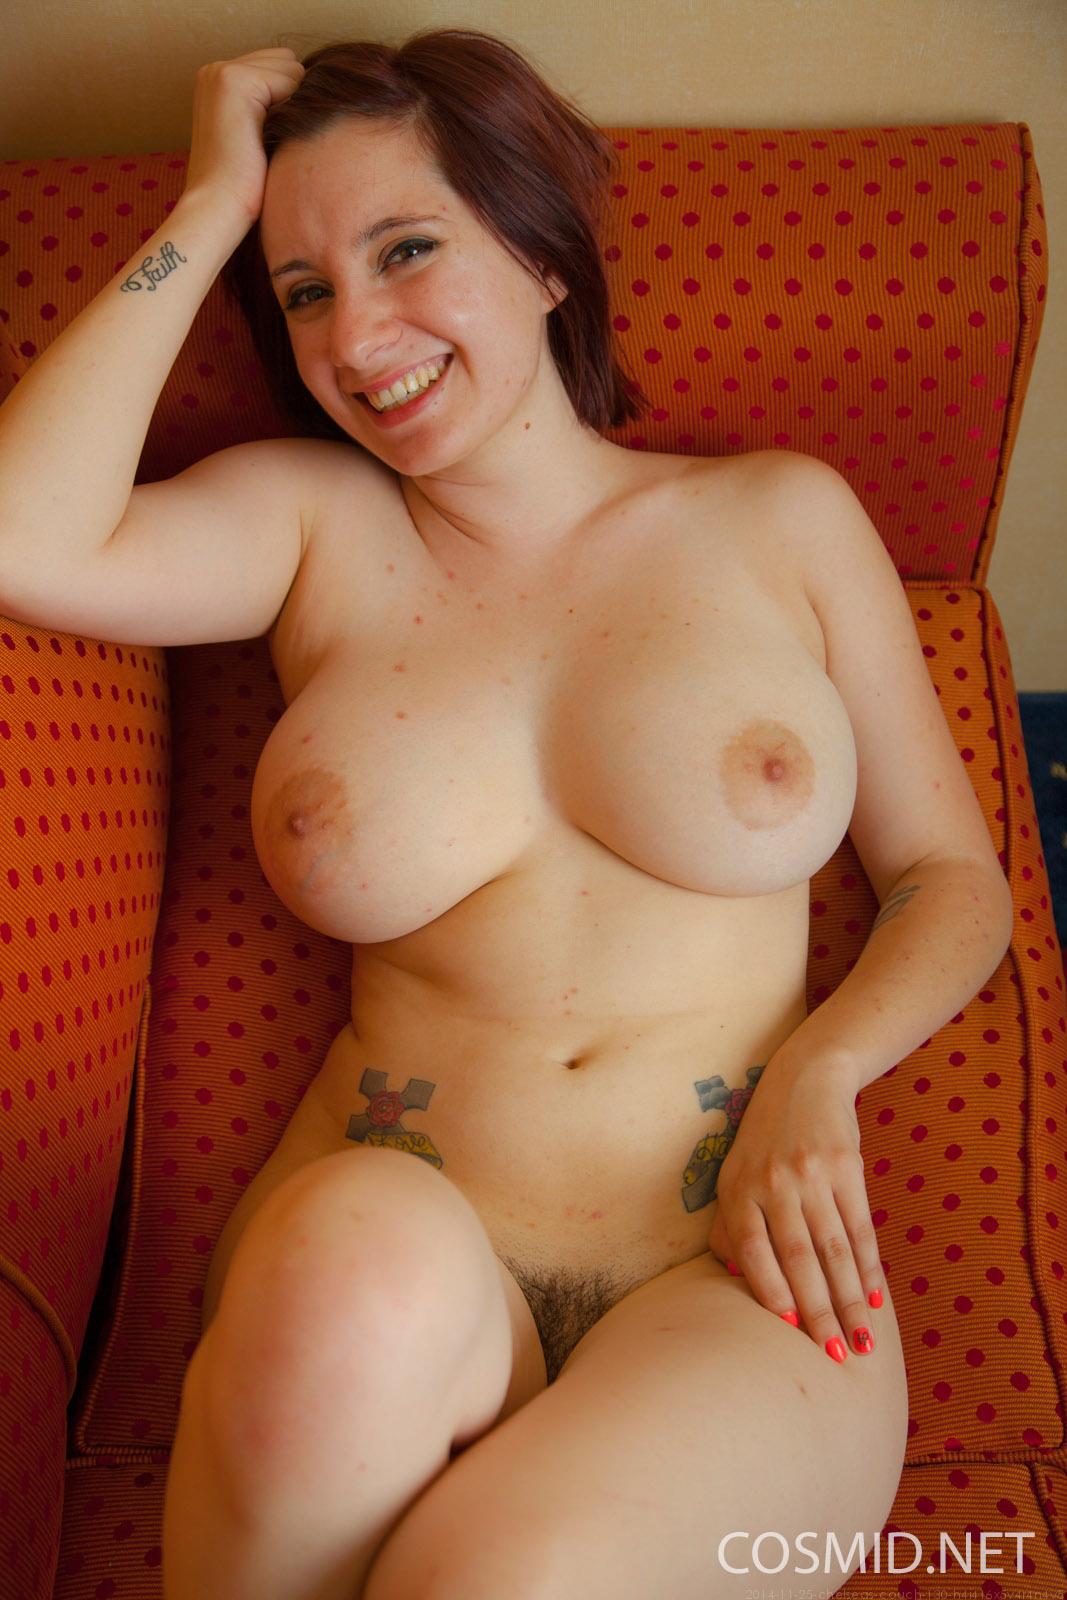 Huge boobs on regular women